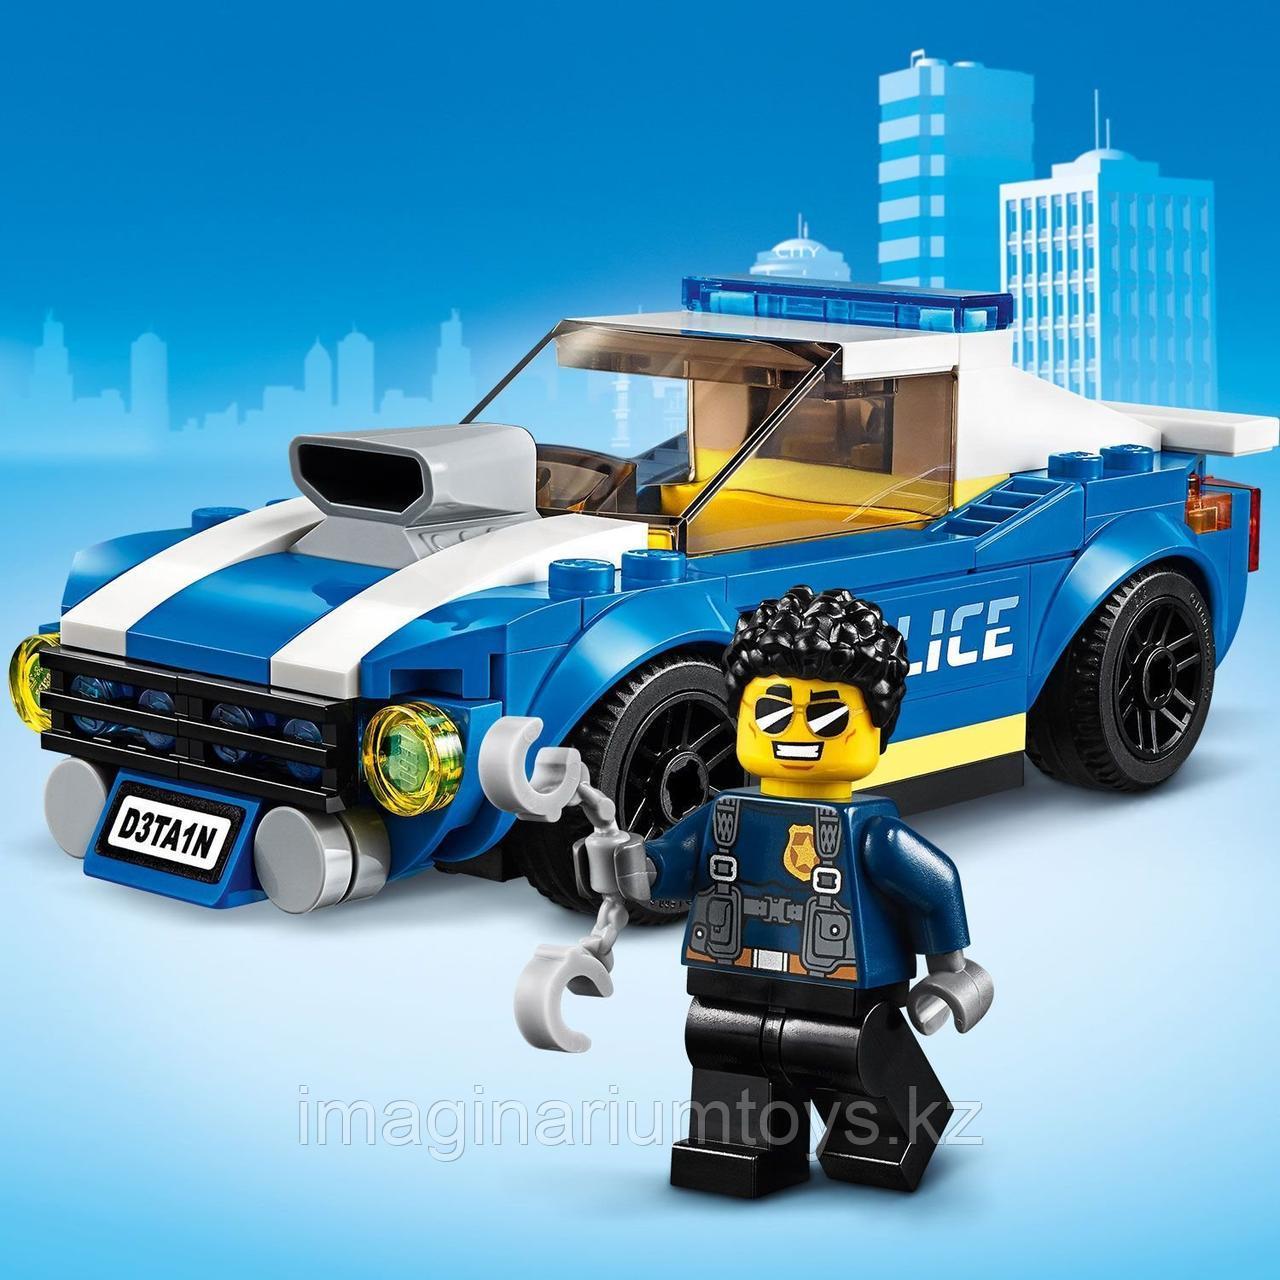 Конструктор LEGO City Лего Город Арест на шоссе 60242 - фото 3